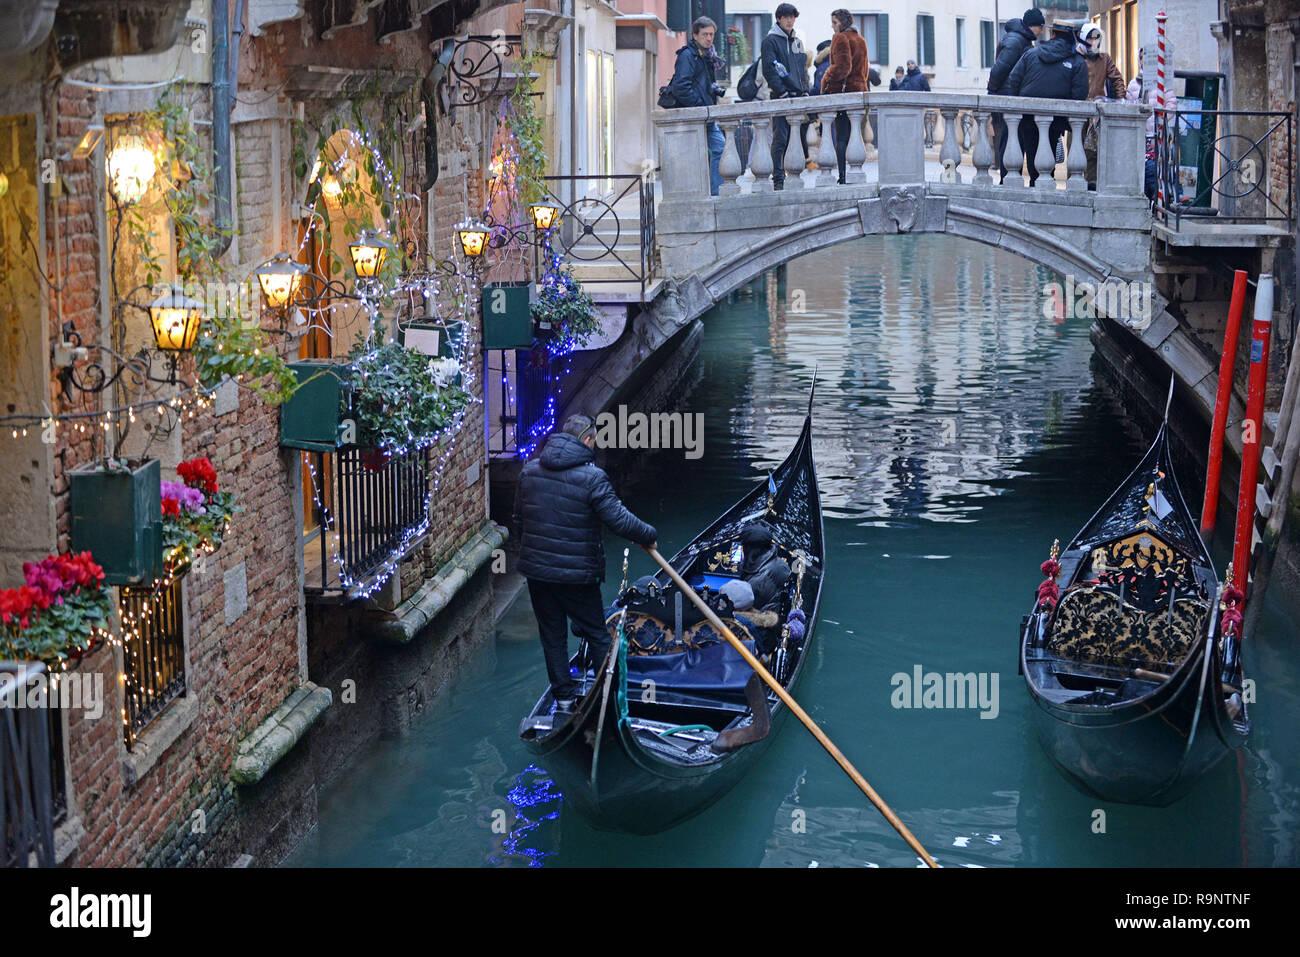 Venice At Christmas 2021 Venice Italy December 26 Christmas Atmosphere In Venice Stock Photo Alamy